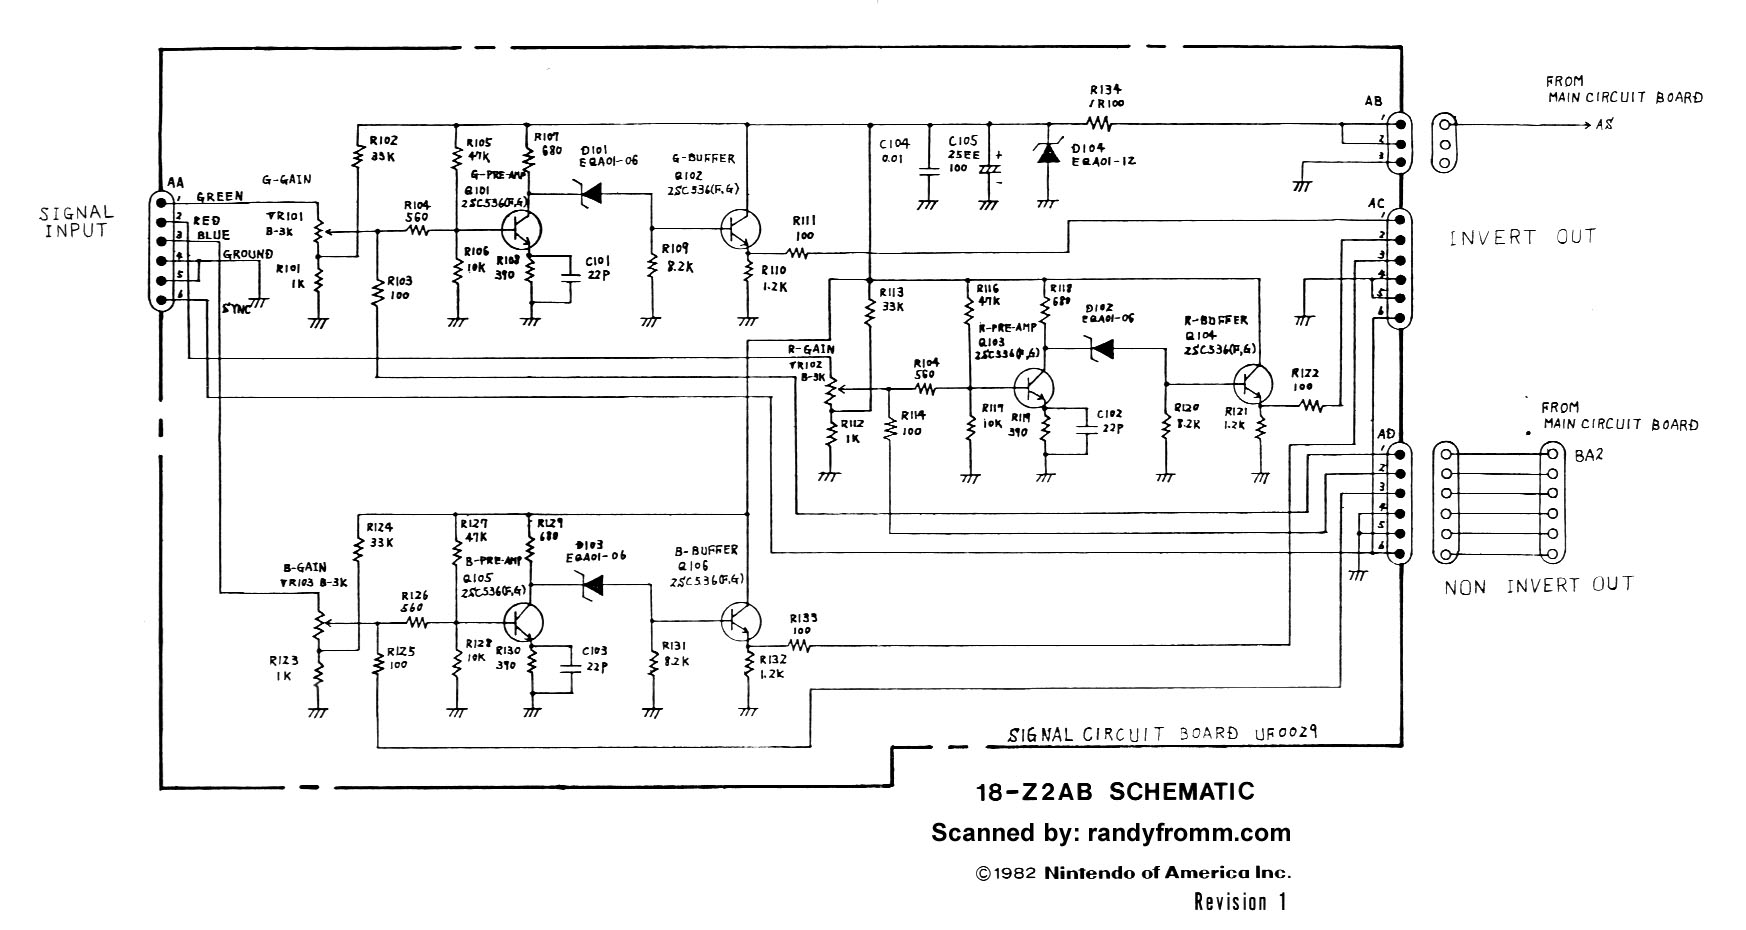 randyfromm.com Technical Department on